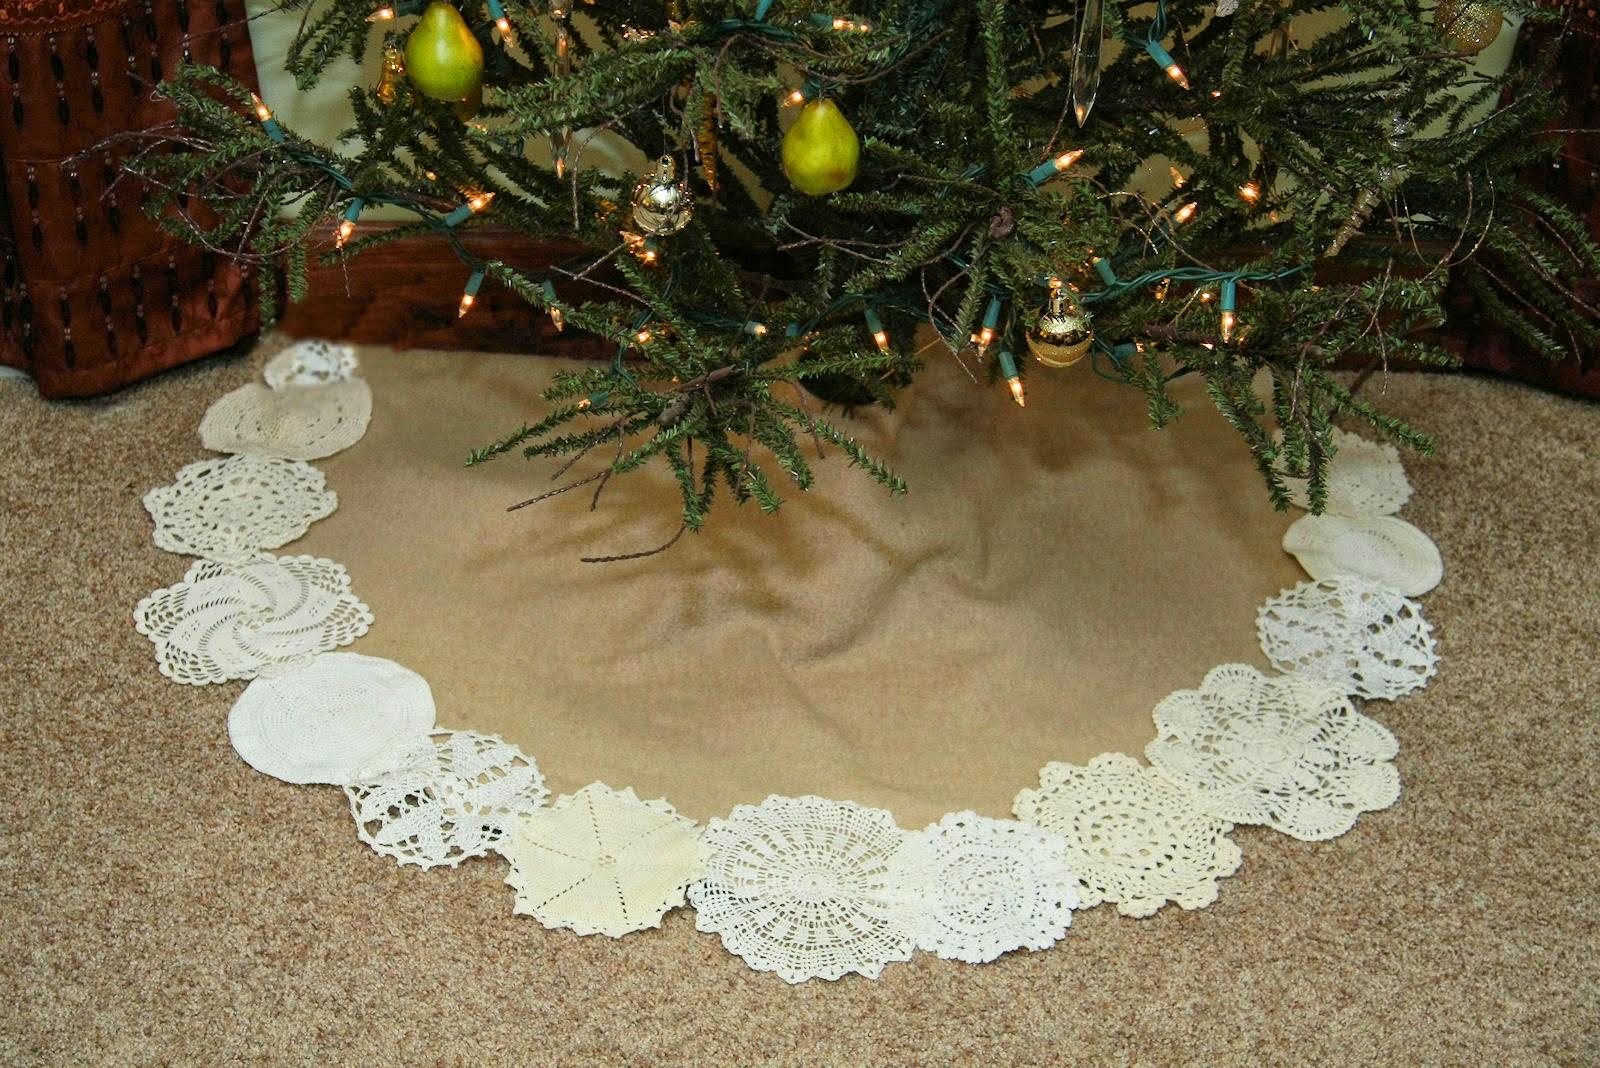 Junkinjane upcycled wool blanket to christmas tree skirt